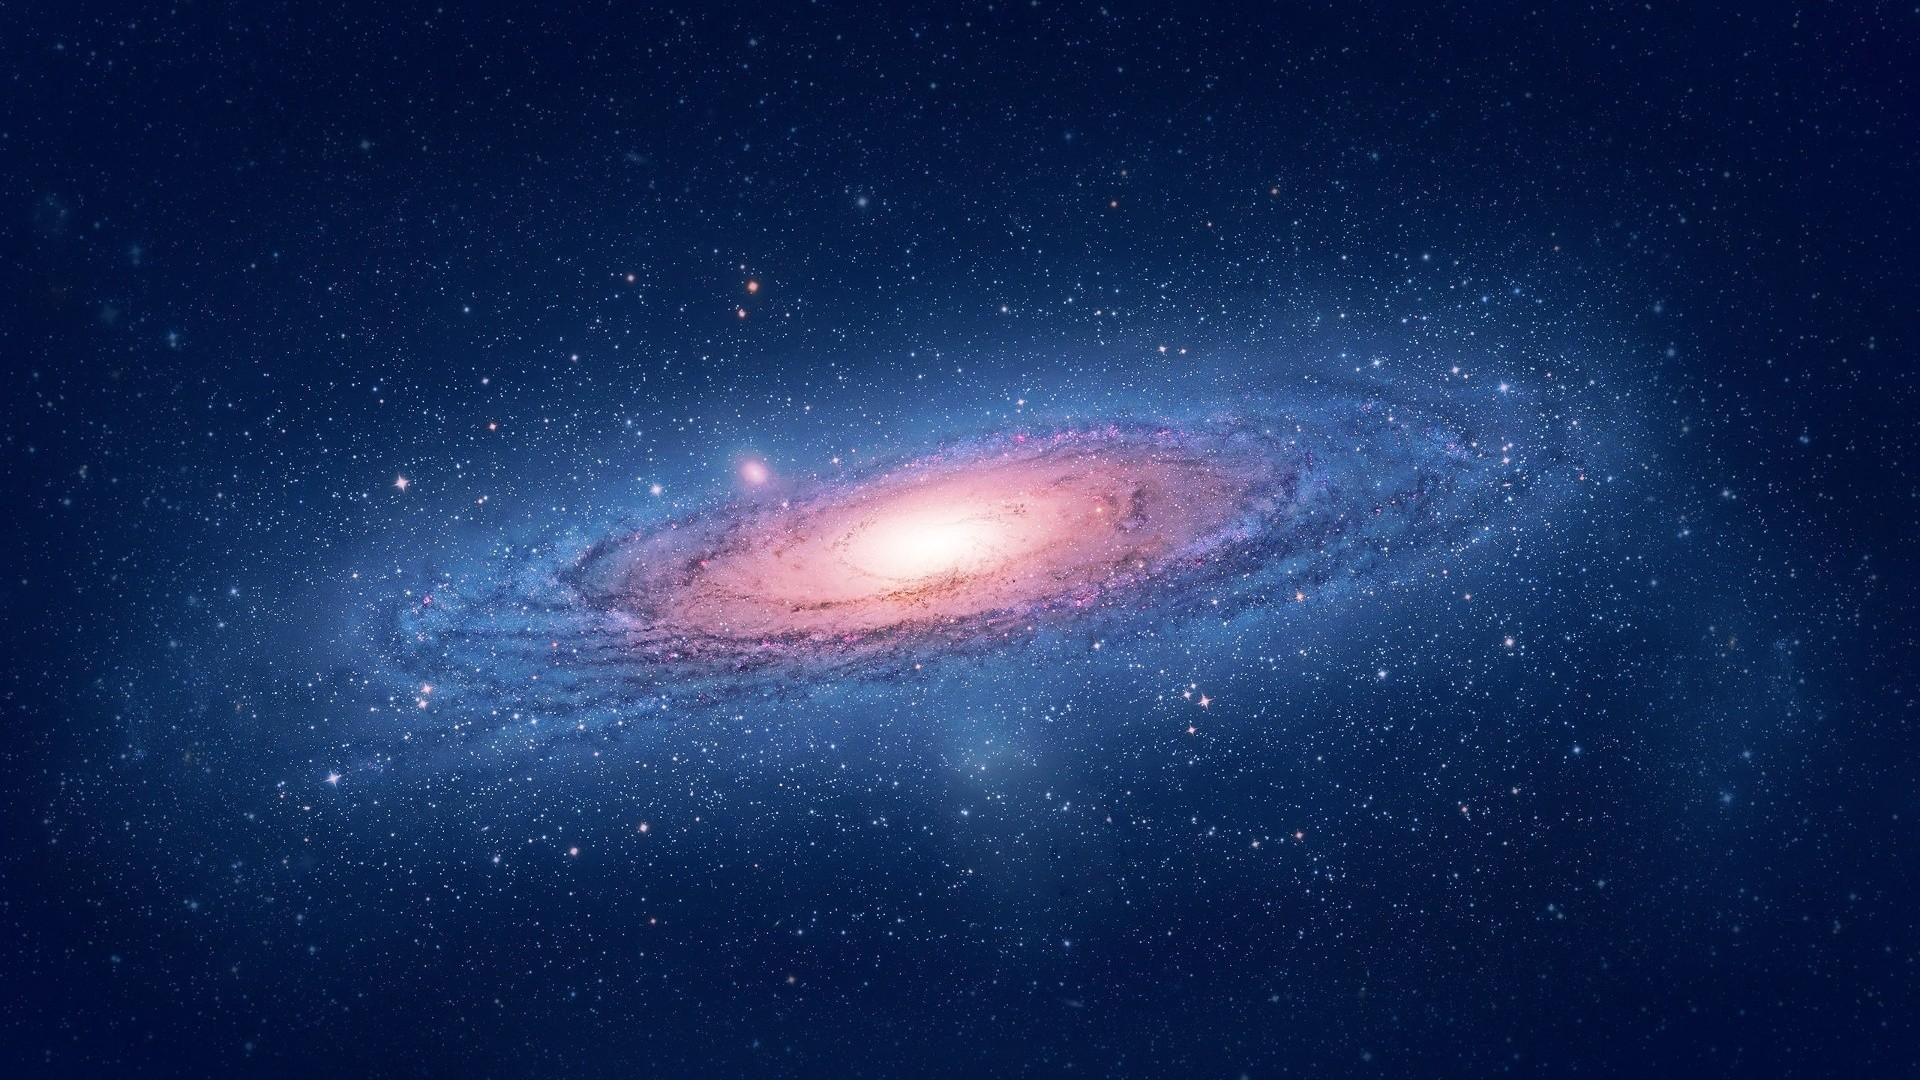 Mac Os X Lion stars, space, galaxy, HD Wallpaper and .